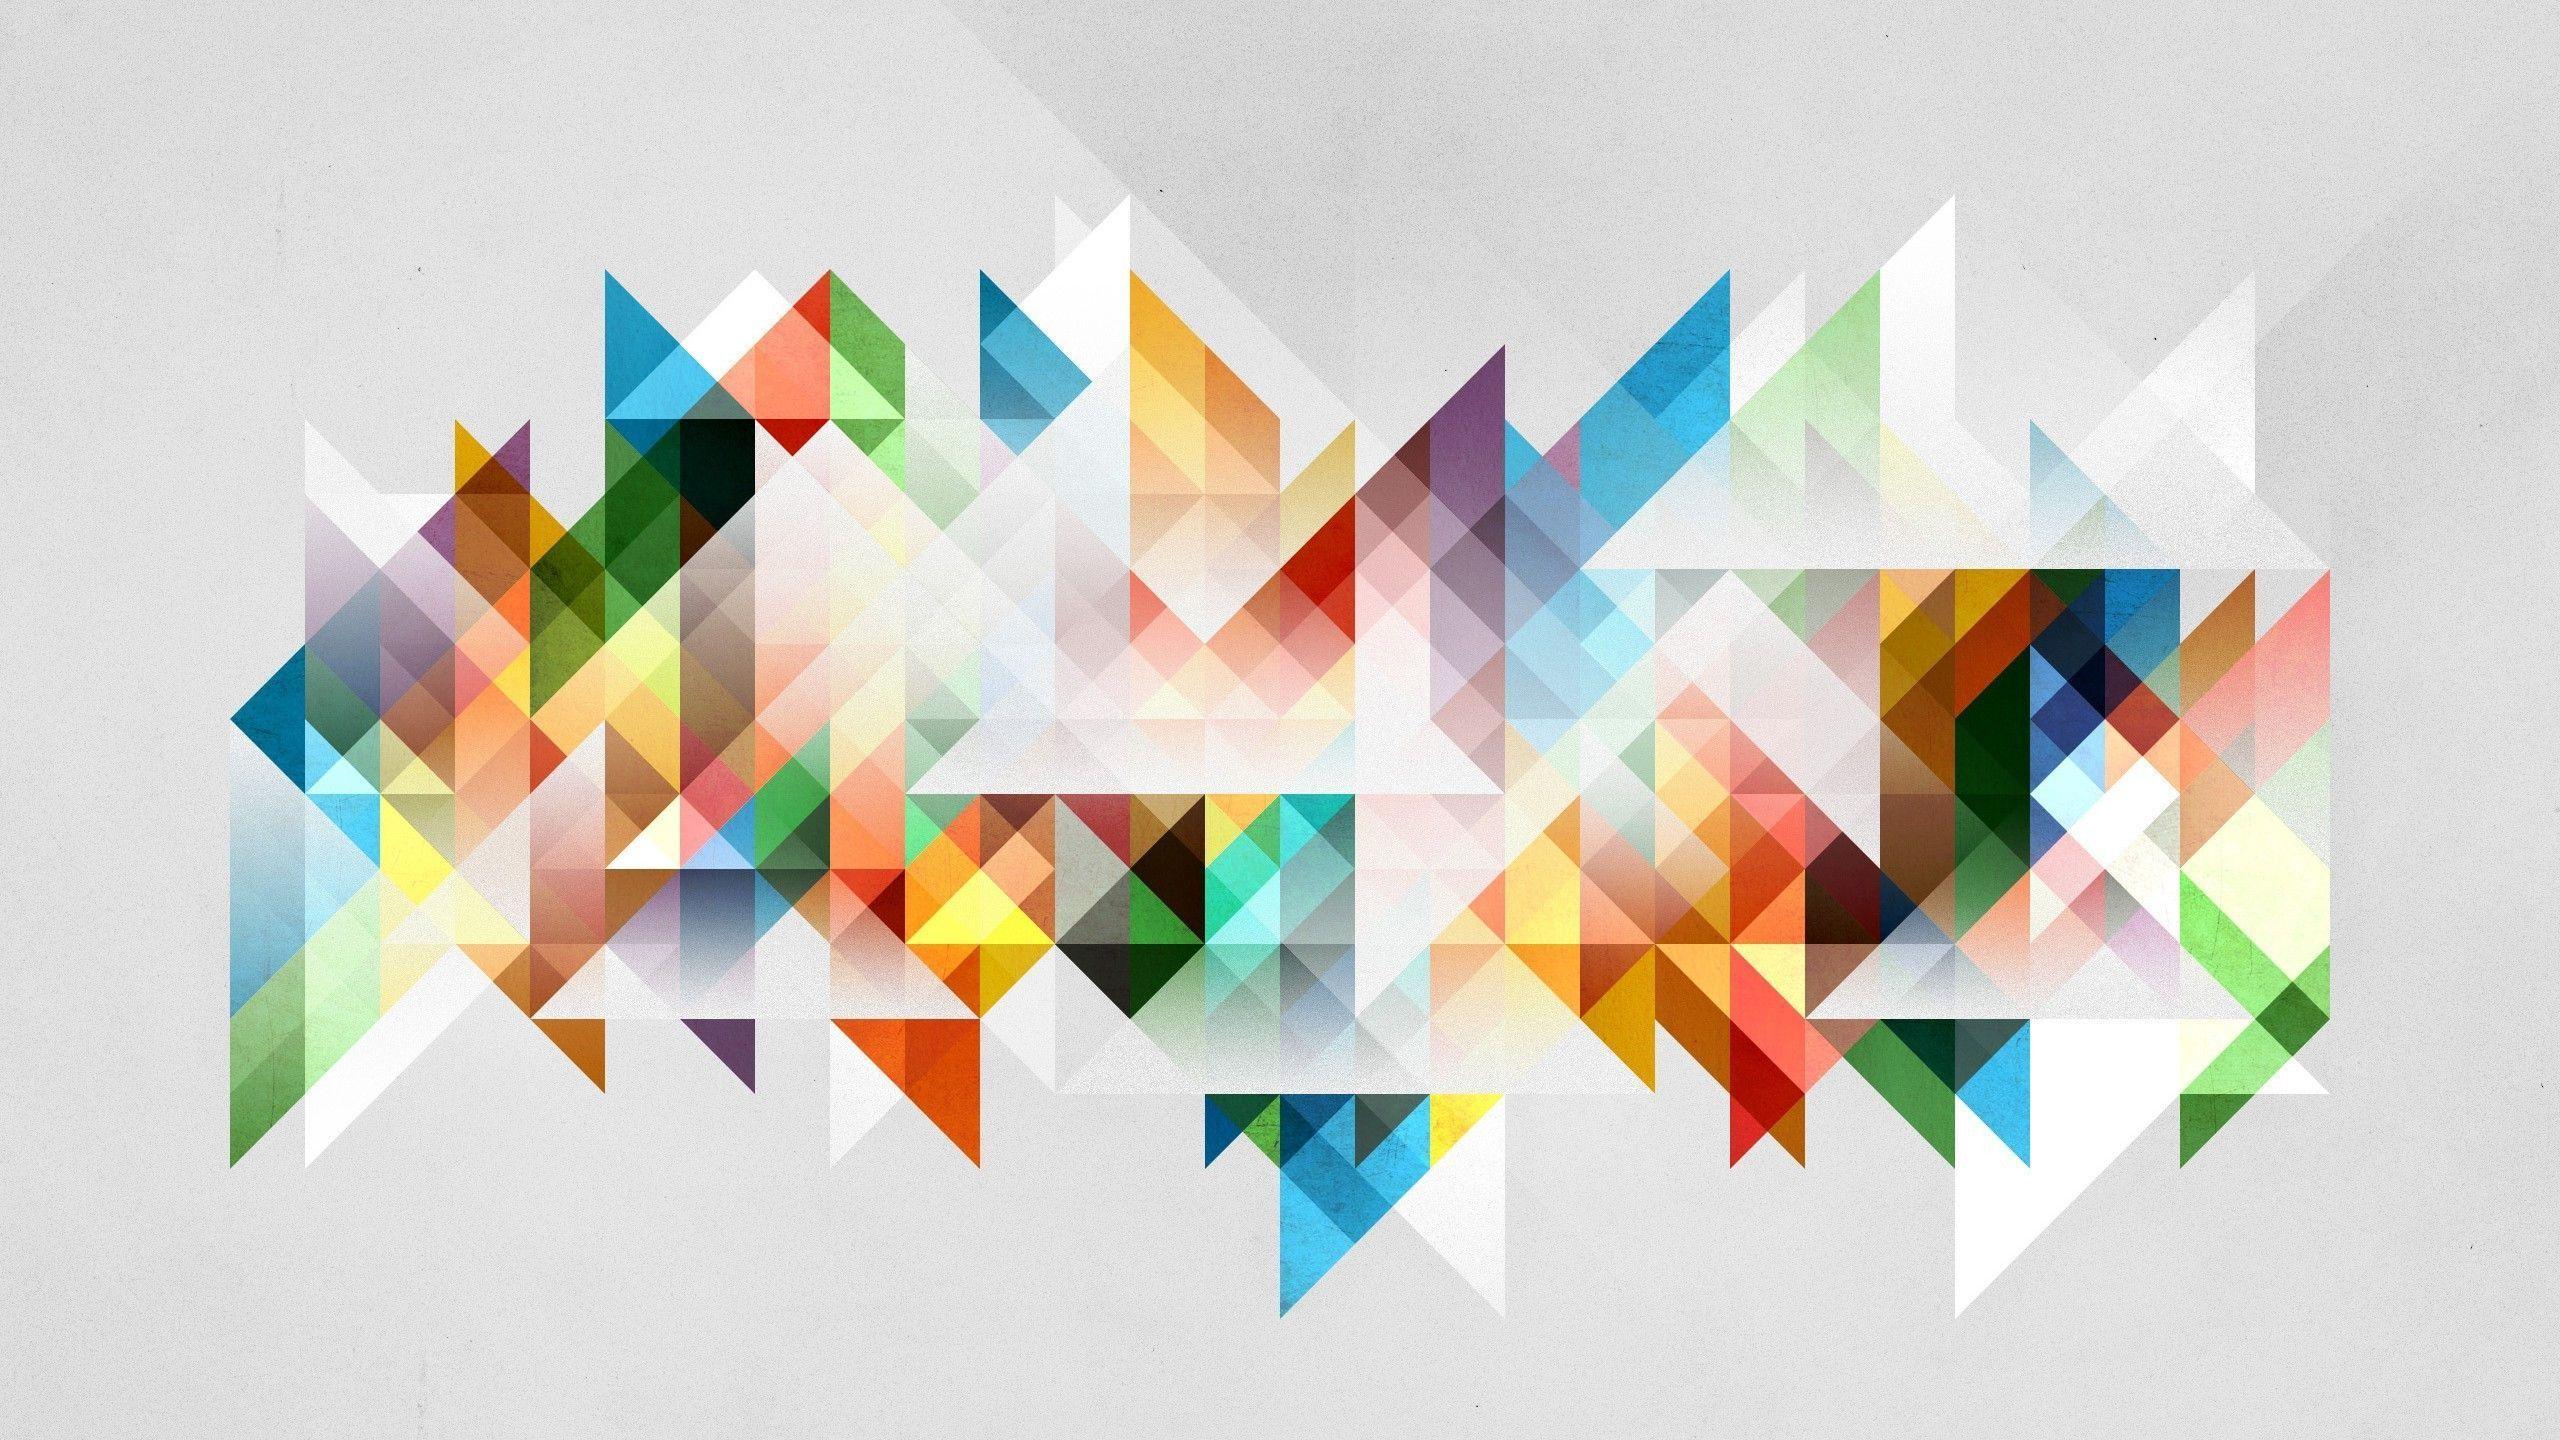 Beautiful Wallpaper High Quality Pastel - a69c43417911cbf1ca1a53b8edeb24d8  Pictures_901842.jpg